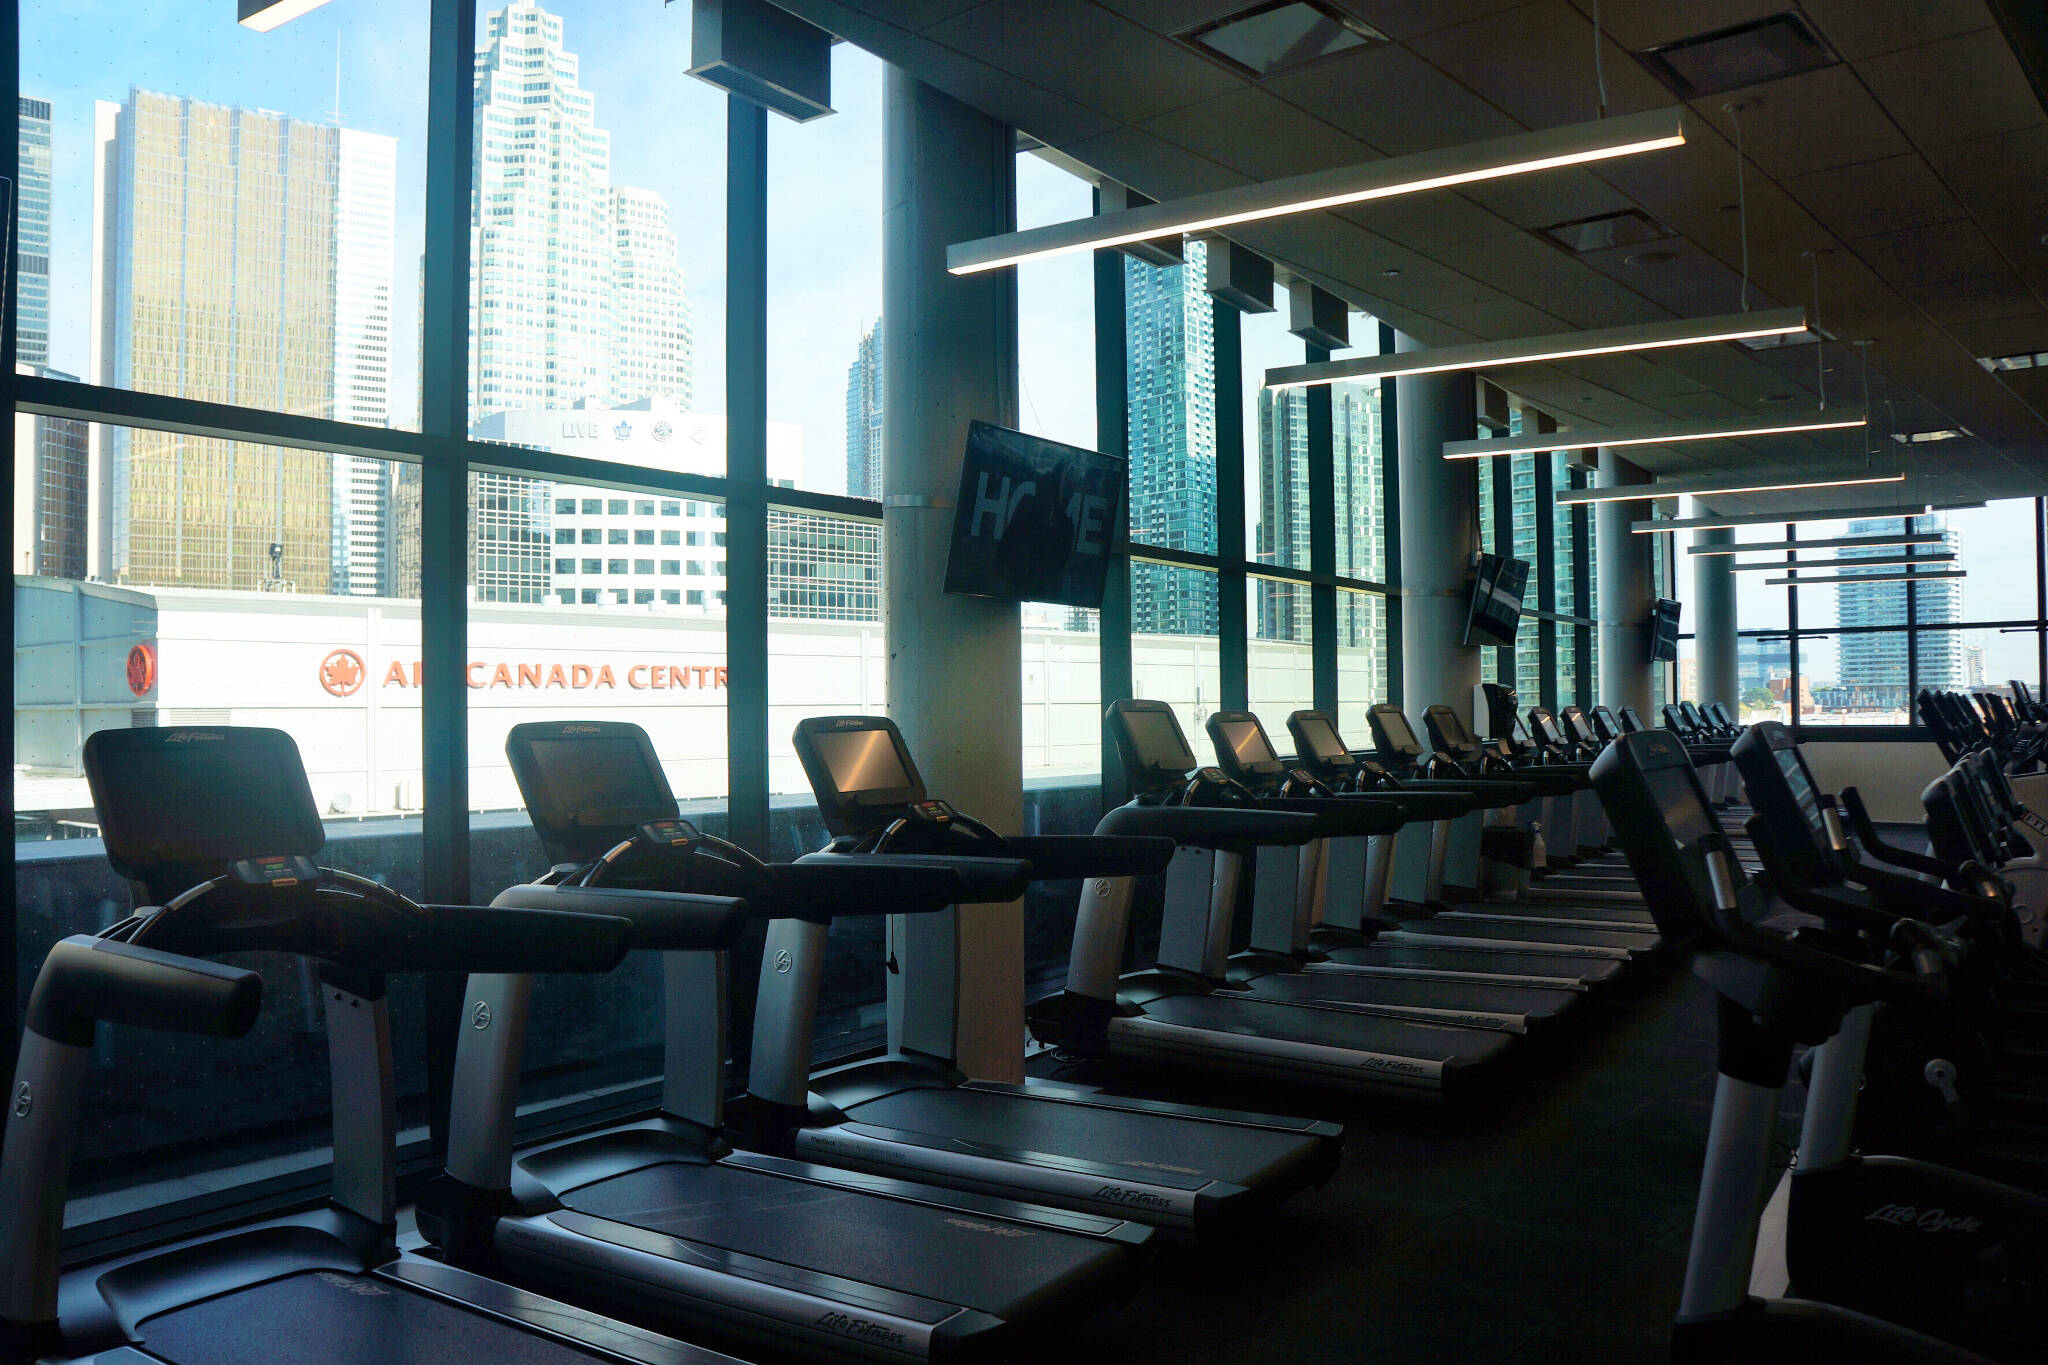 Pure Fitness Toronto